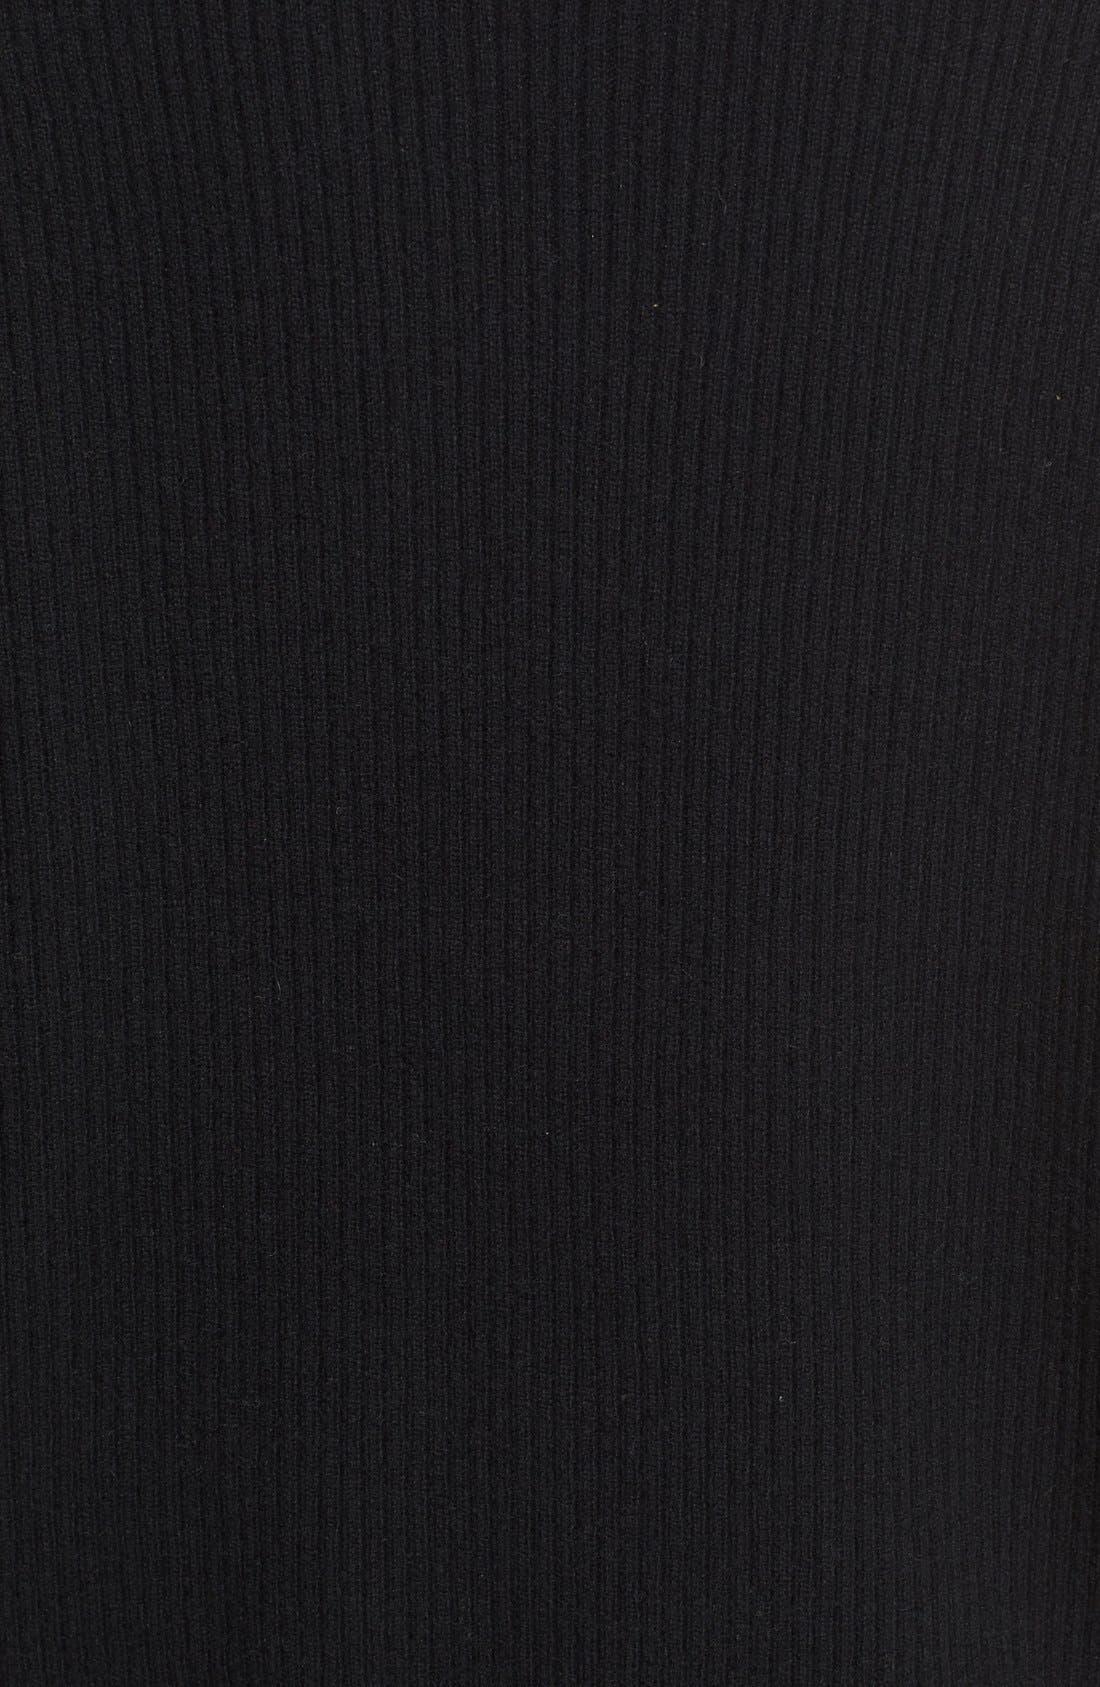 VINCE, Rib Knit Raglan Sleeve Cashmere Sweater, Alternate thumbnail 5, color, 001